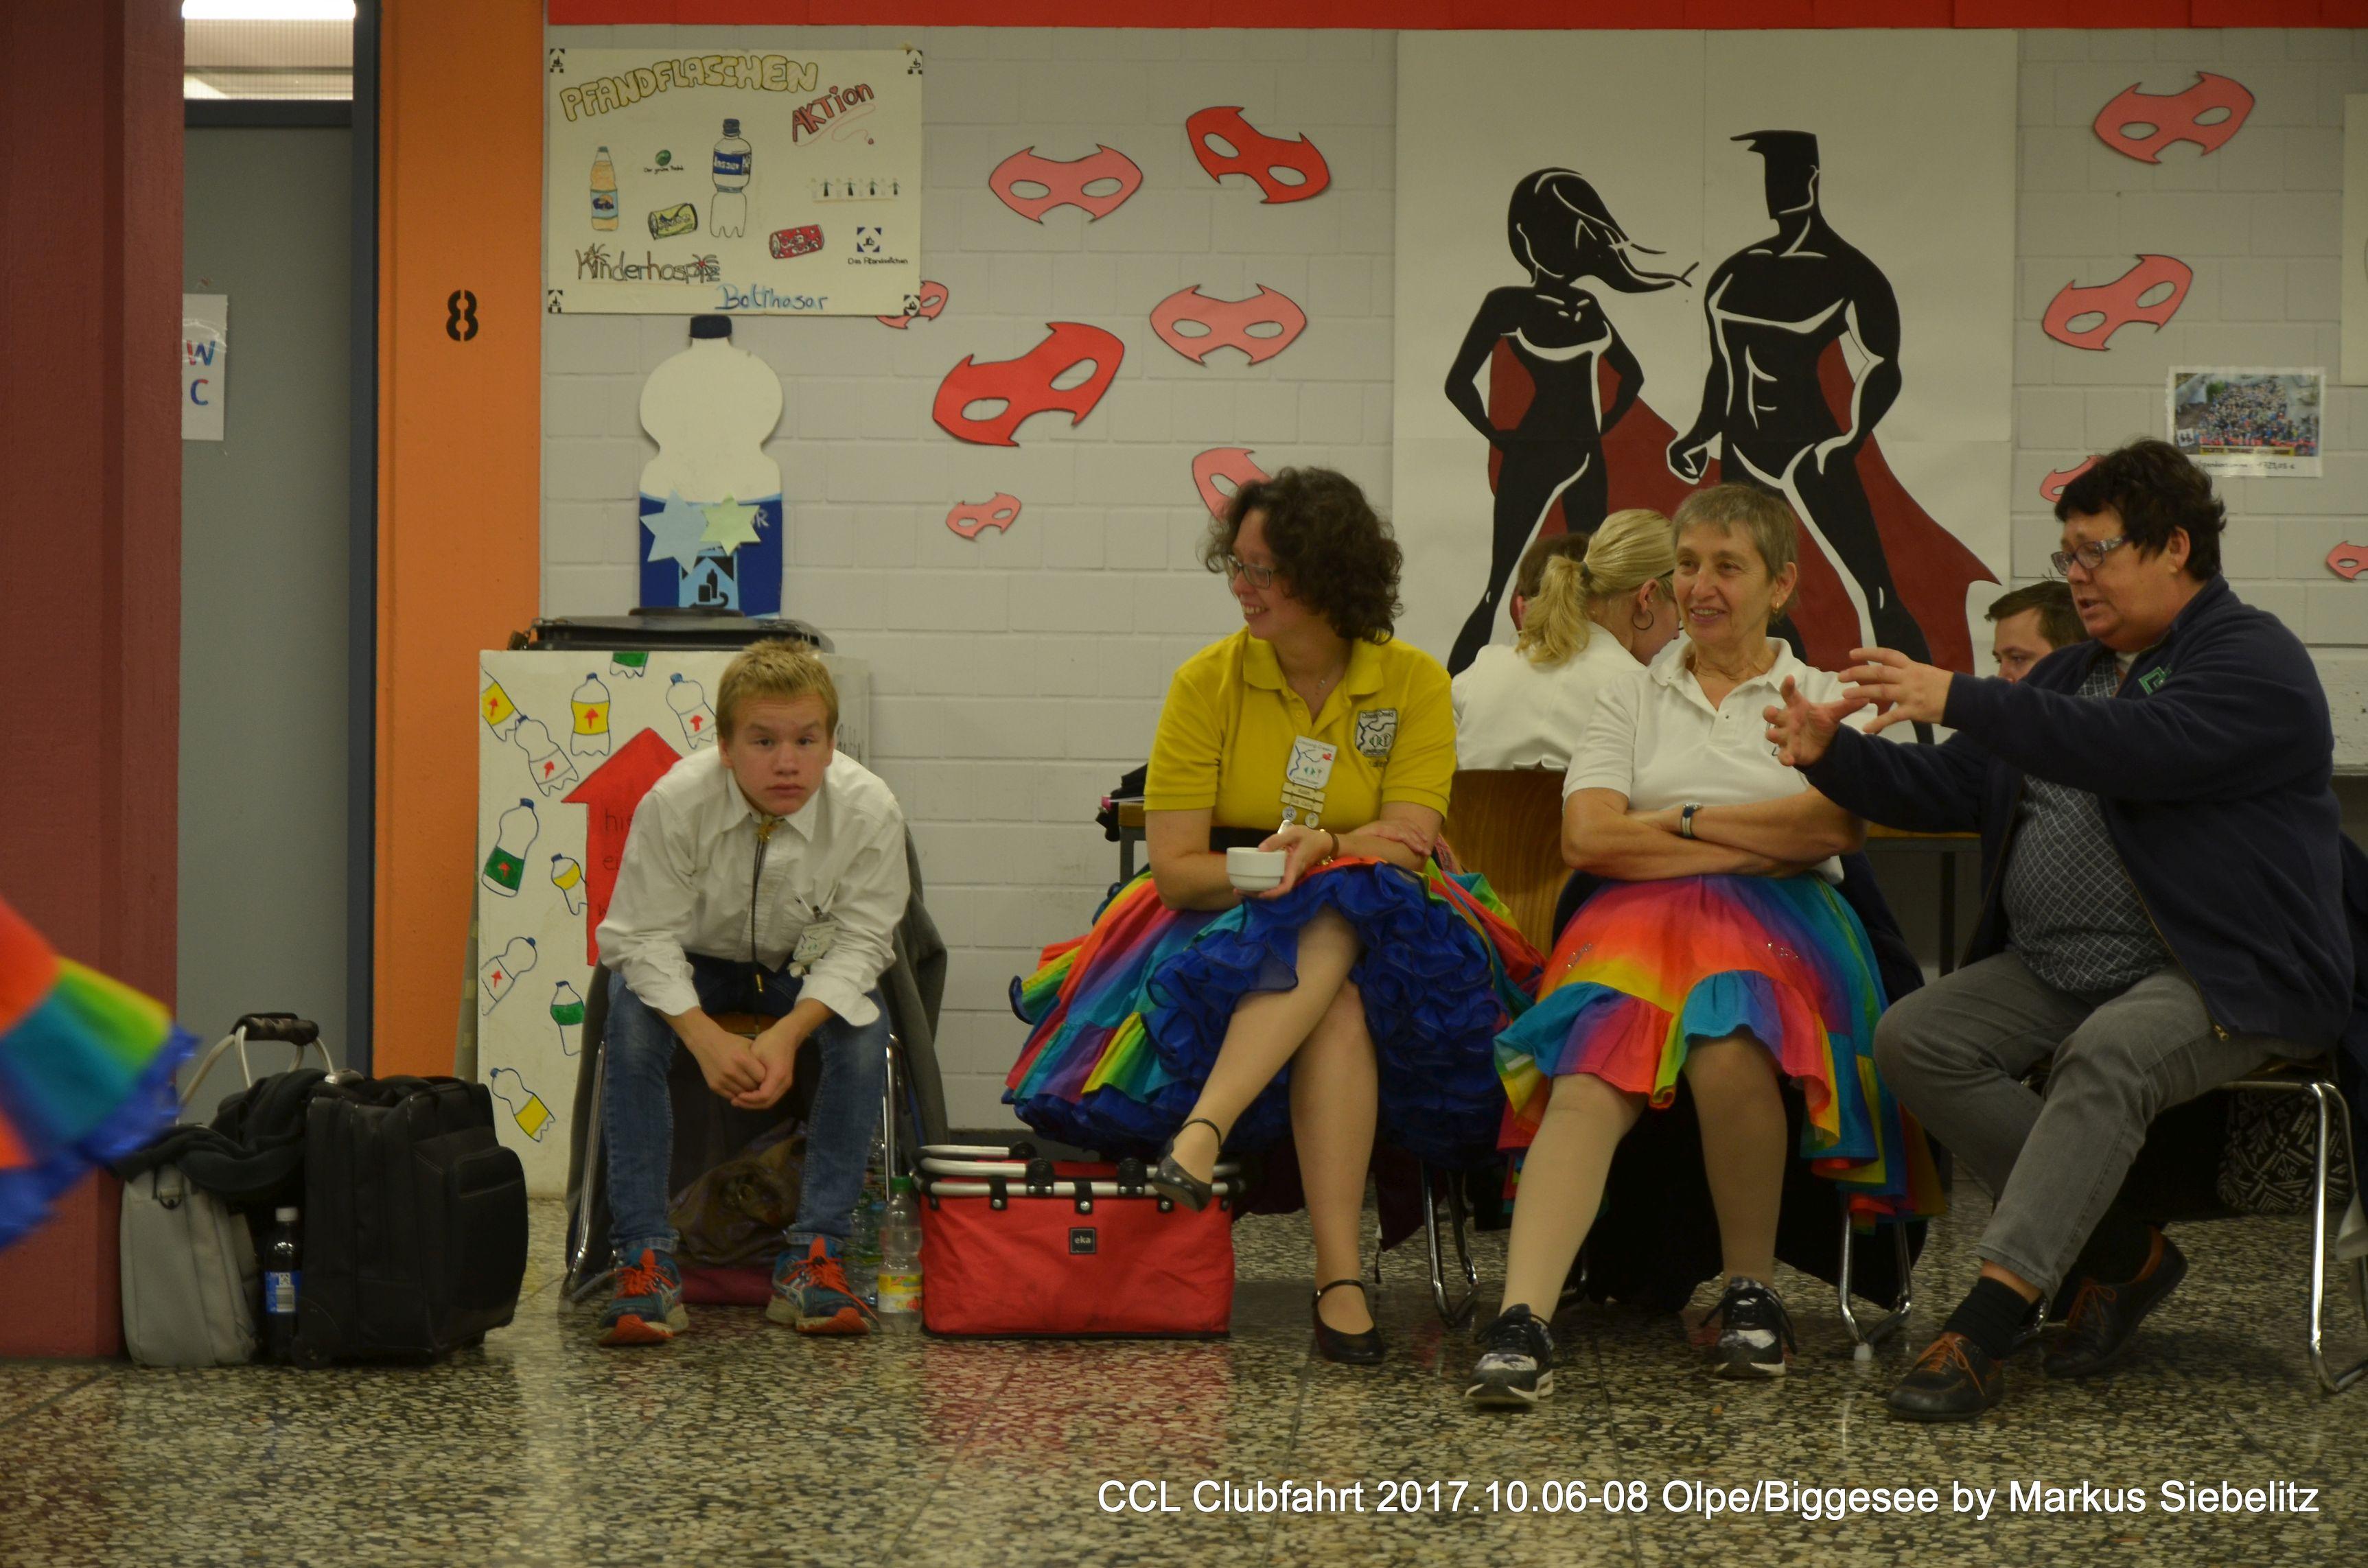 CCL Clubfahrt 2017.10.06-08 Biggesee (61)